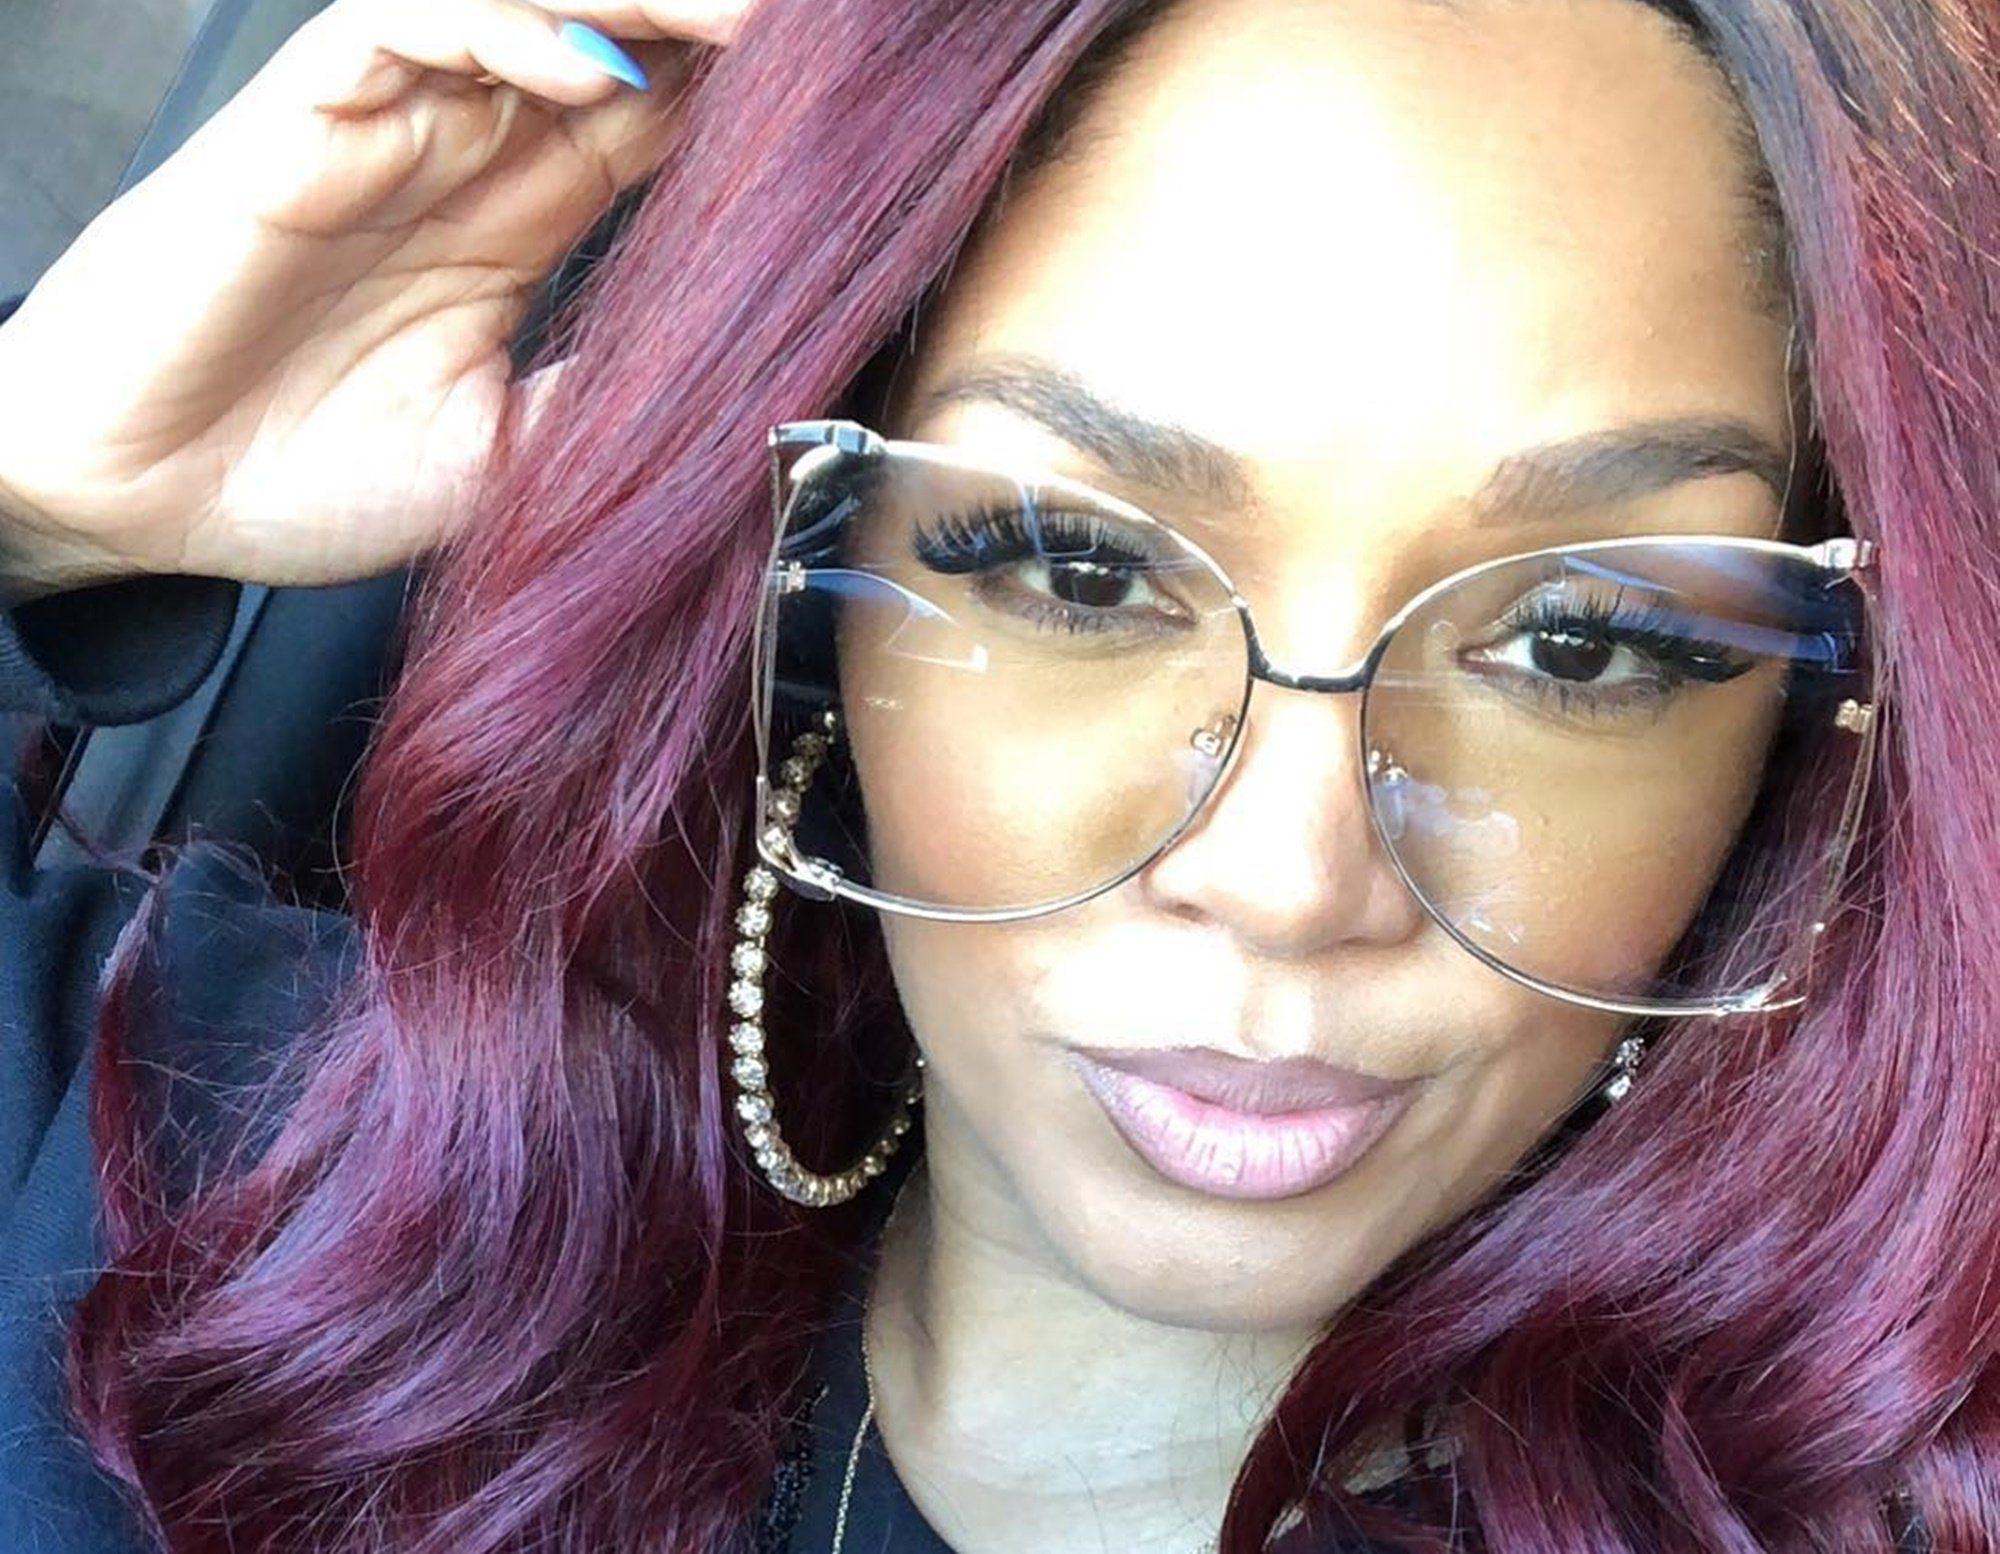 Rasheeda Frost Goes Makeup Free In New Photo Love Hip Hop Atlanta Fans Say Kirk Is To Blame For Her Tired Looking Face Rasheeda Frost Rasheeda Latest Hairdo